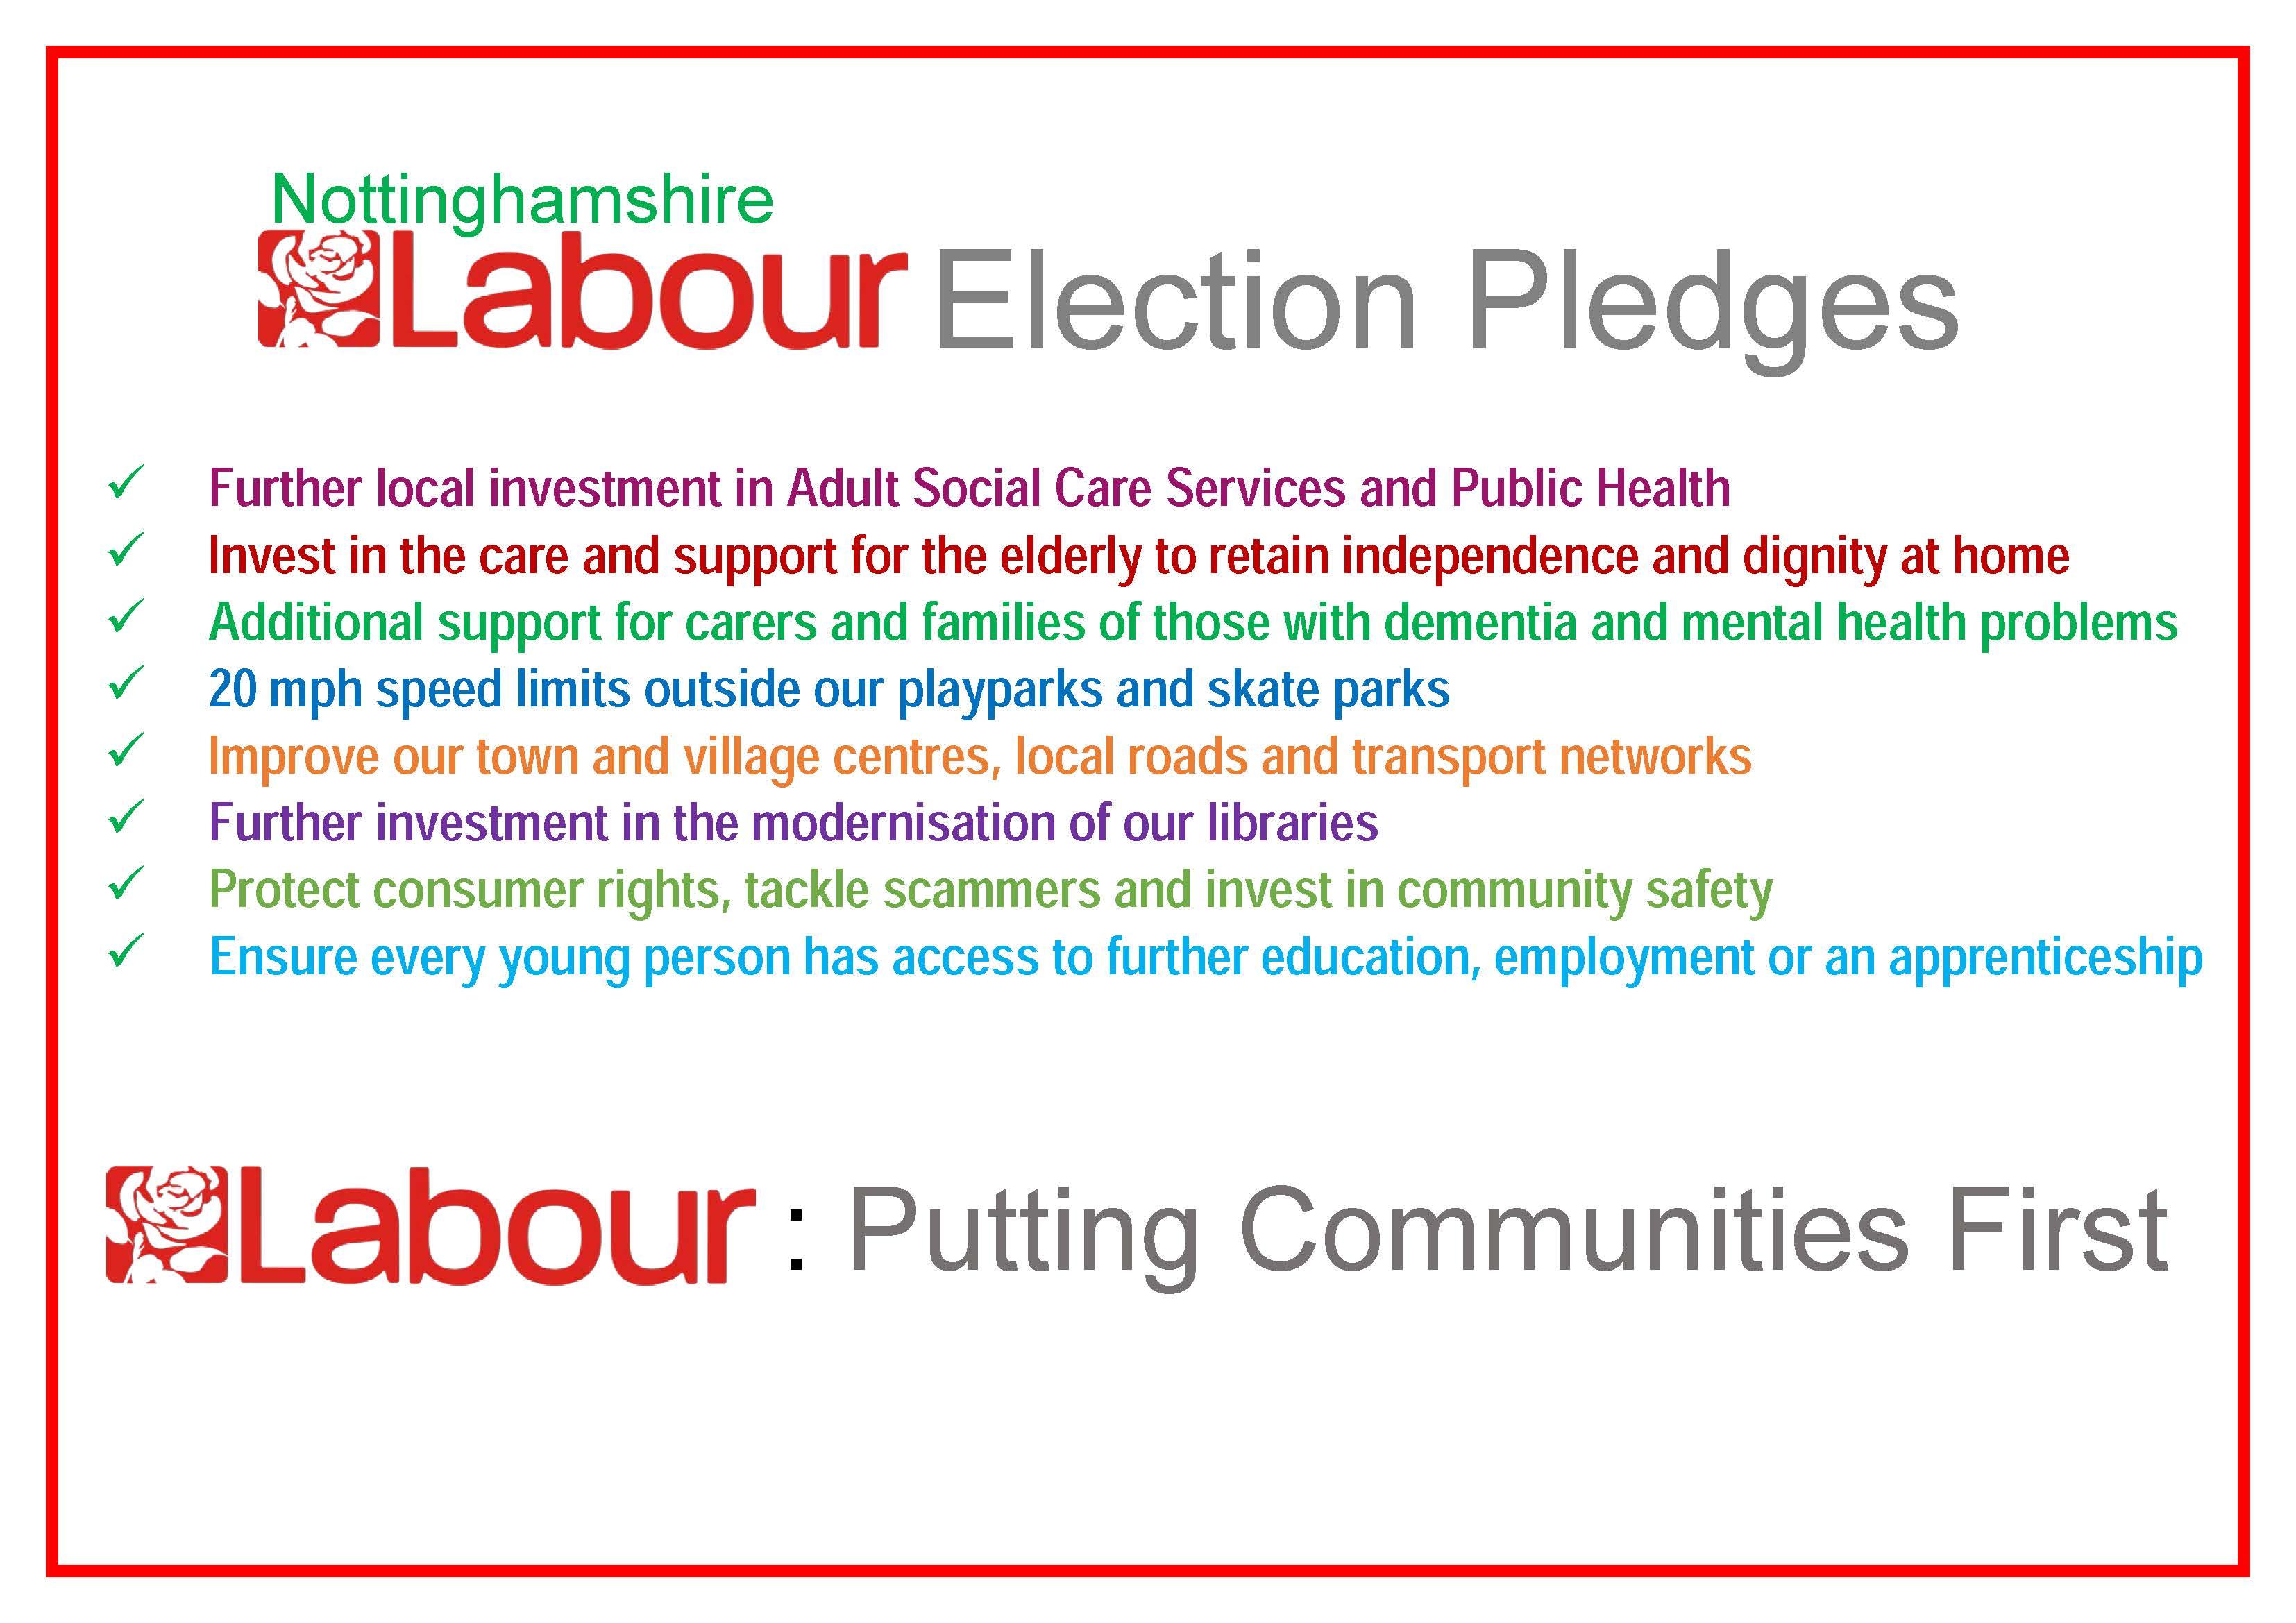 ElectionPledges.jpg